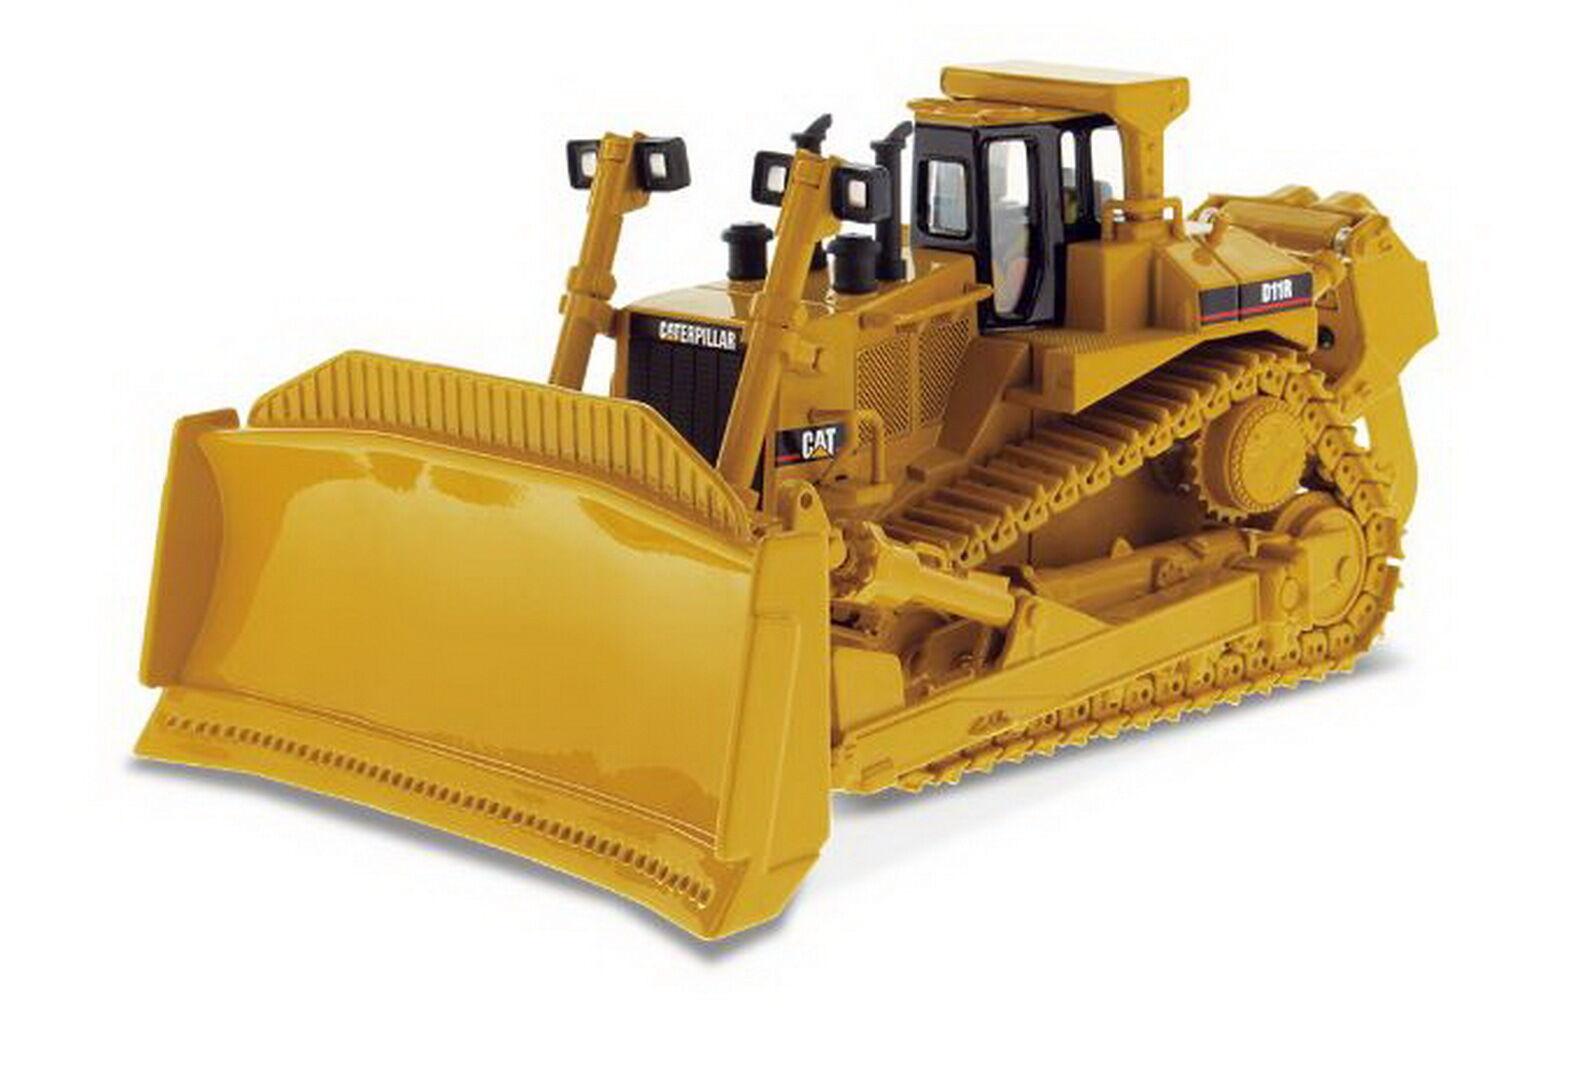 1/50 dm Caterpillar Cat D11R Pista Tipo Tractor Diecast modelos 85025